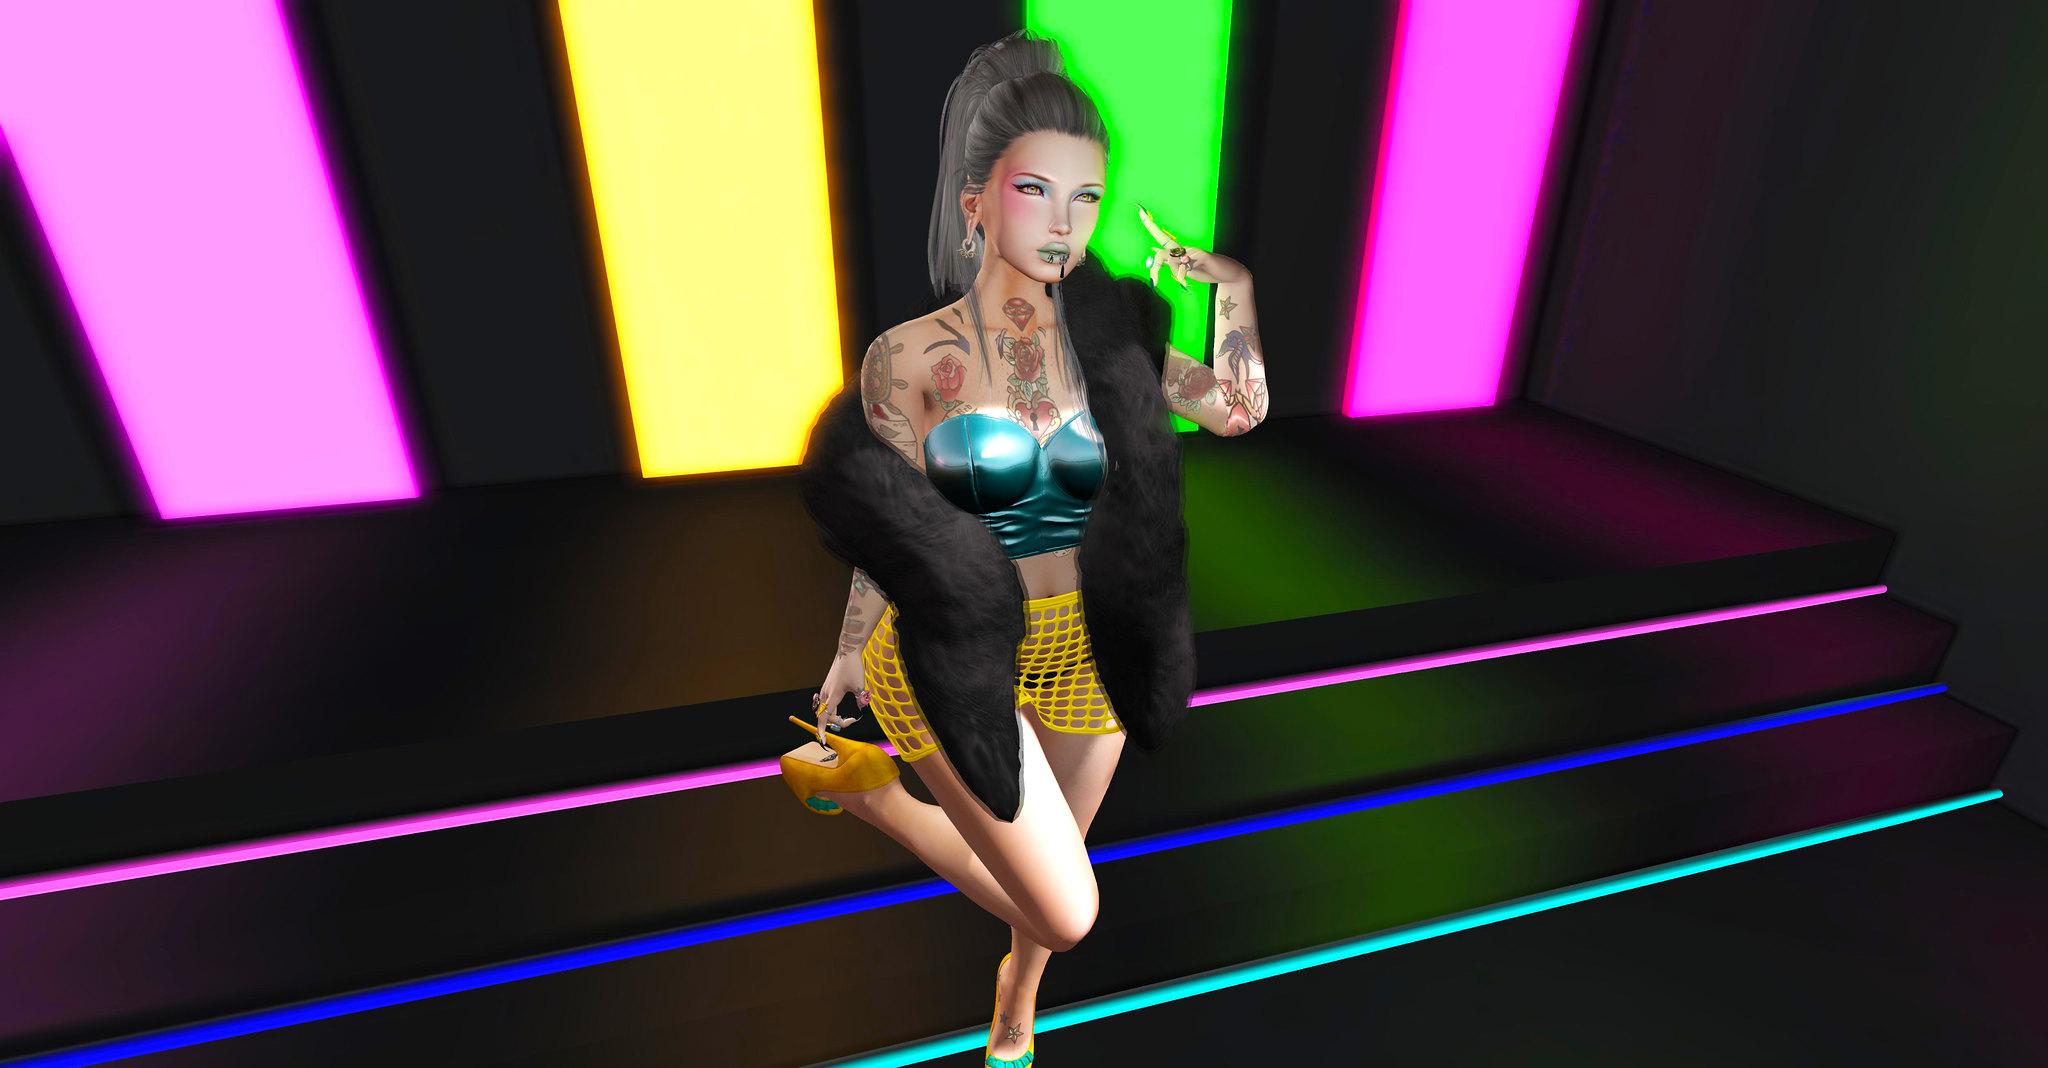 neon_002phto